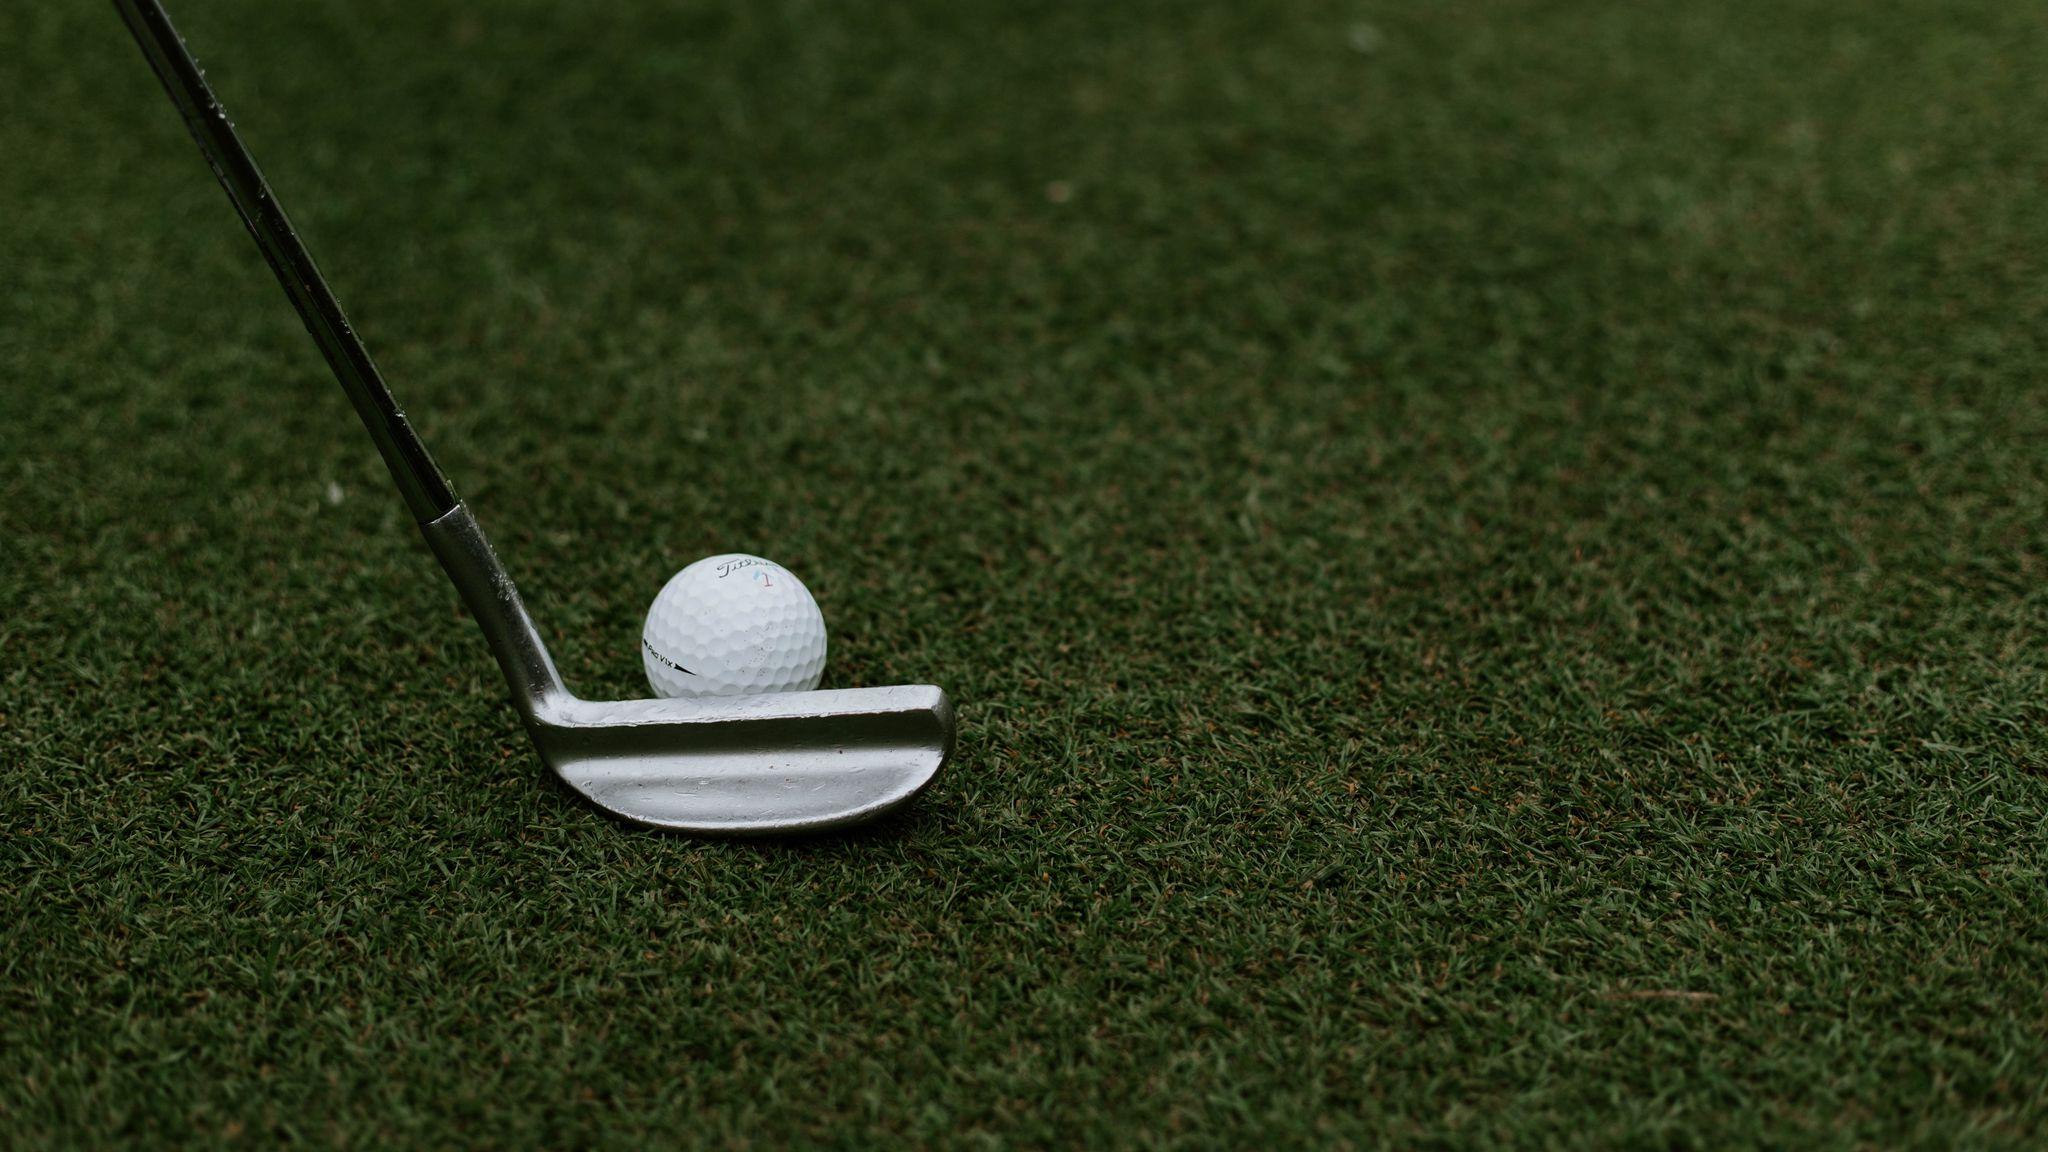 2048x1152 Wallpaper golf, ball, club